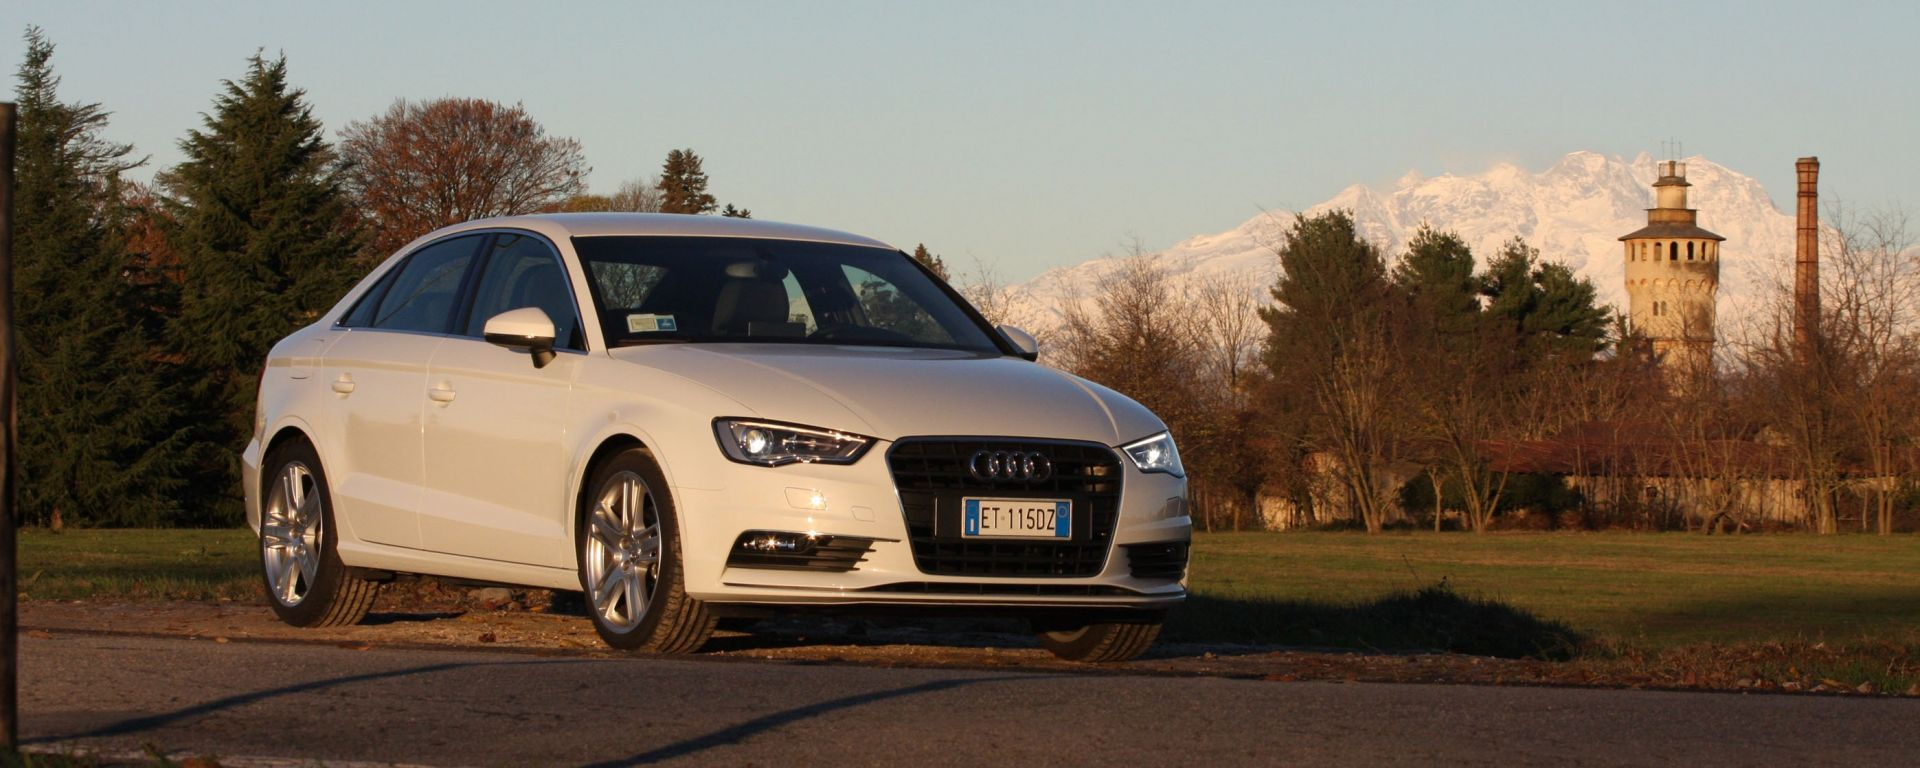 Audi A3 Sedan 1.4 TFSI